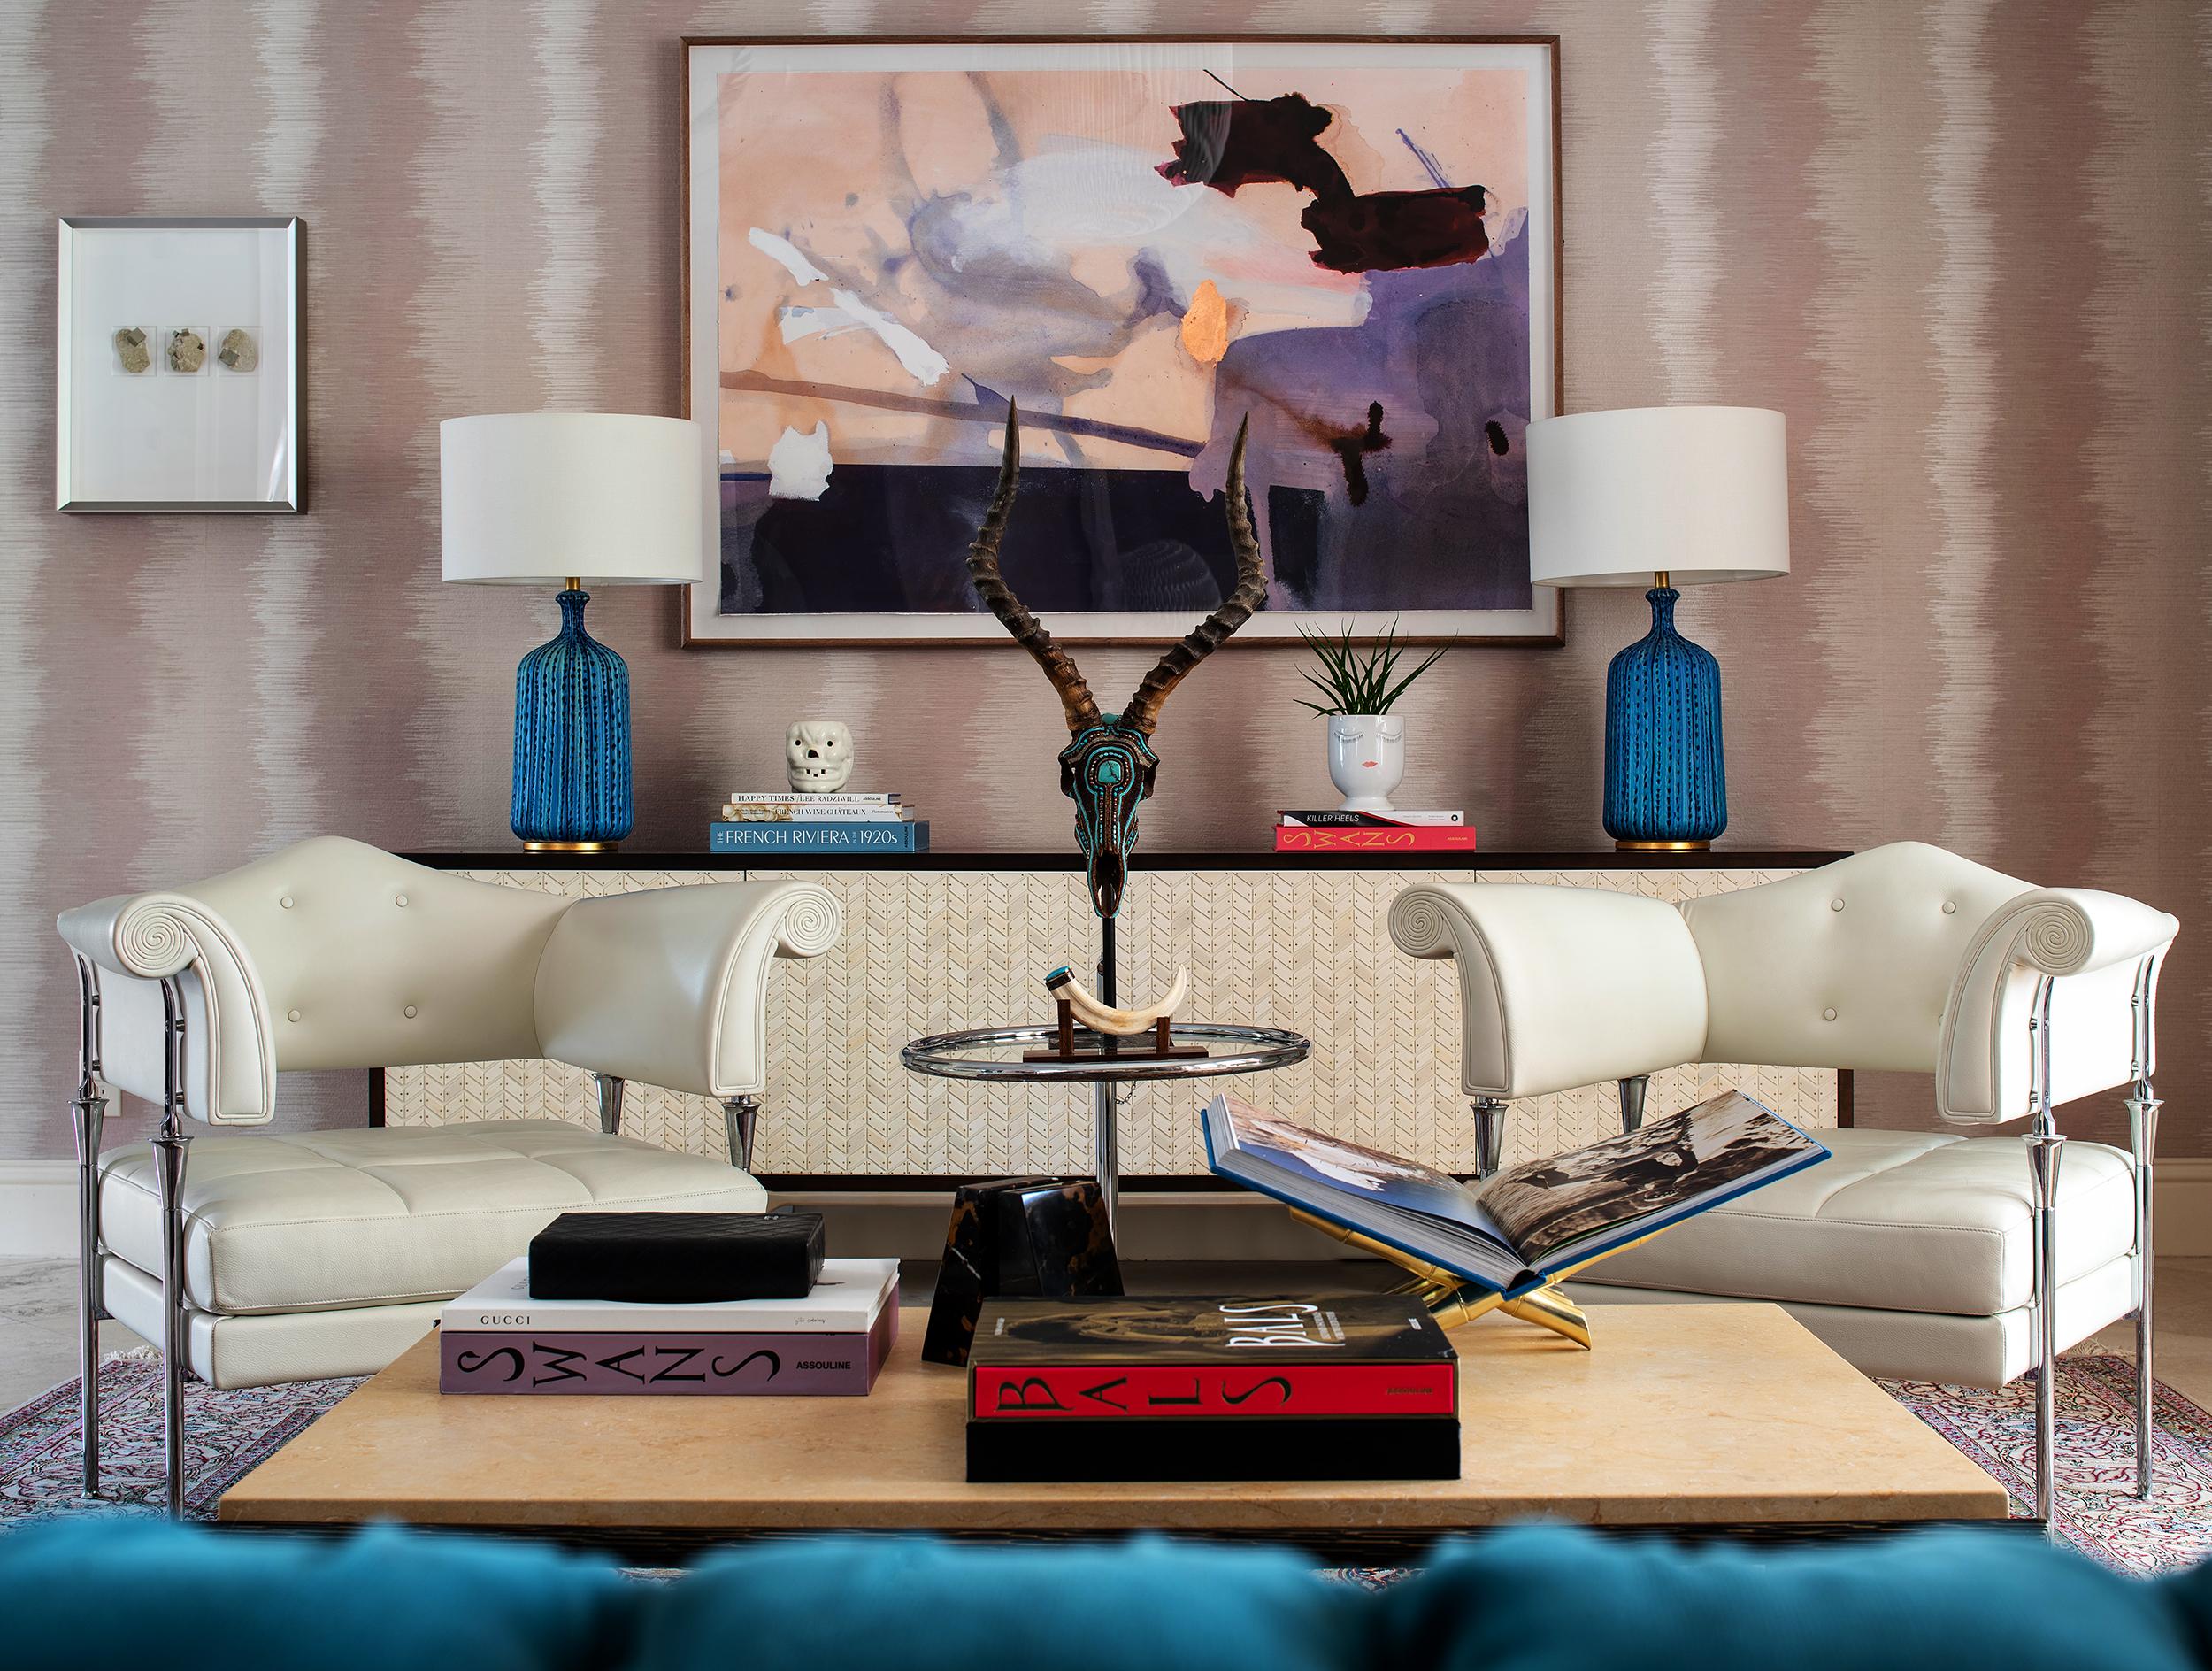 kylie-ponton---martinique---living-room---45-pano.jpeg